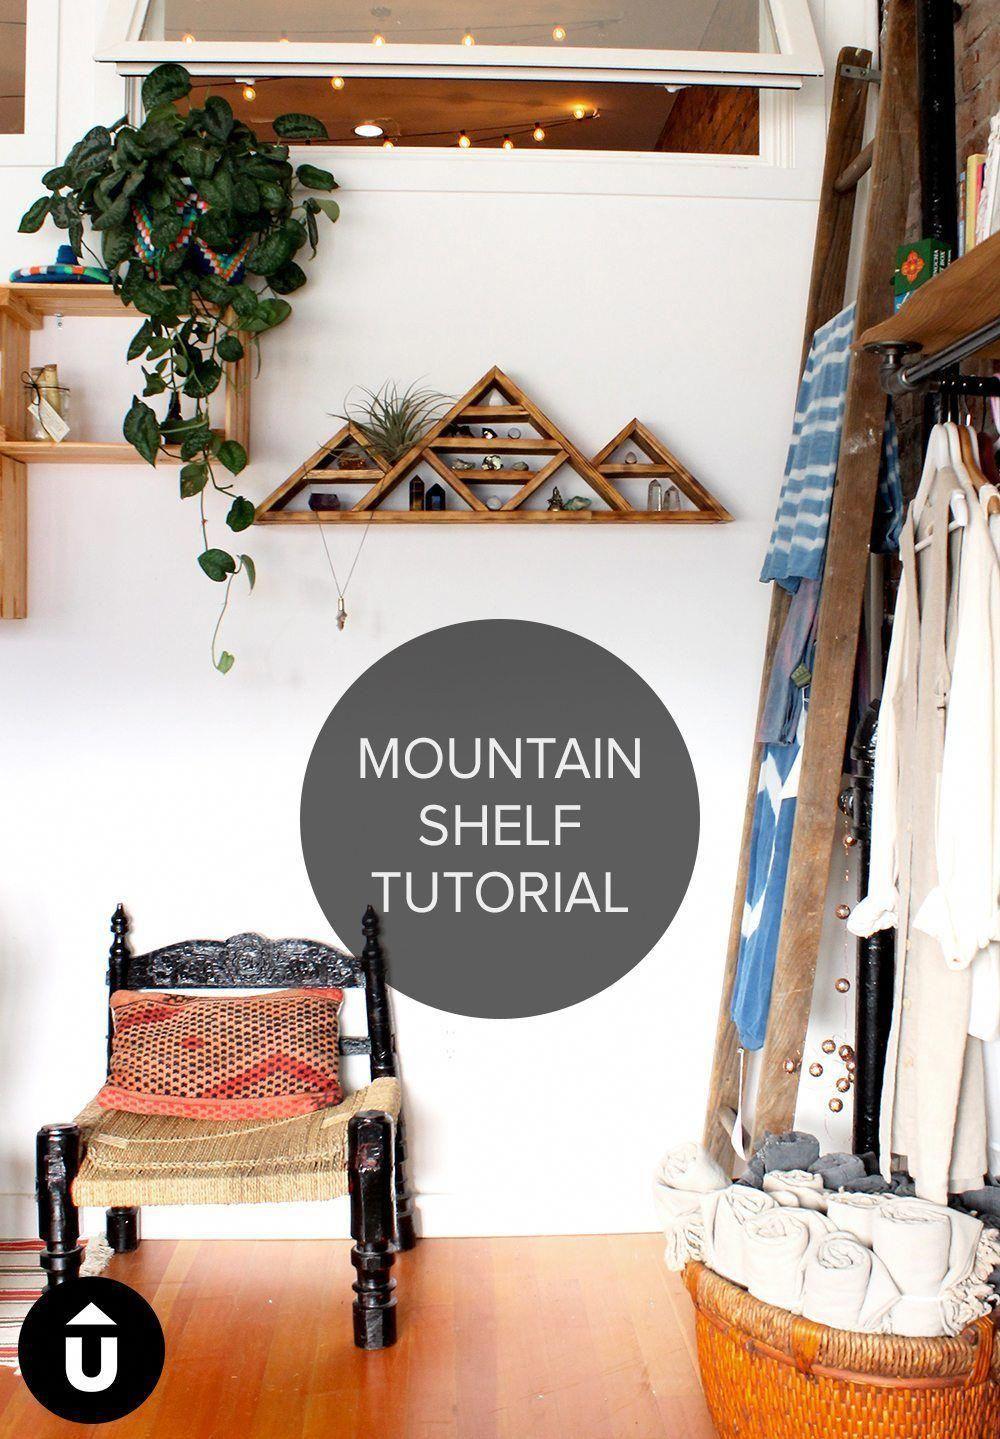 Mountain Shelf Tutorial Upcycle That Diywoodchristmas Diy Wood